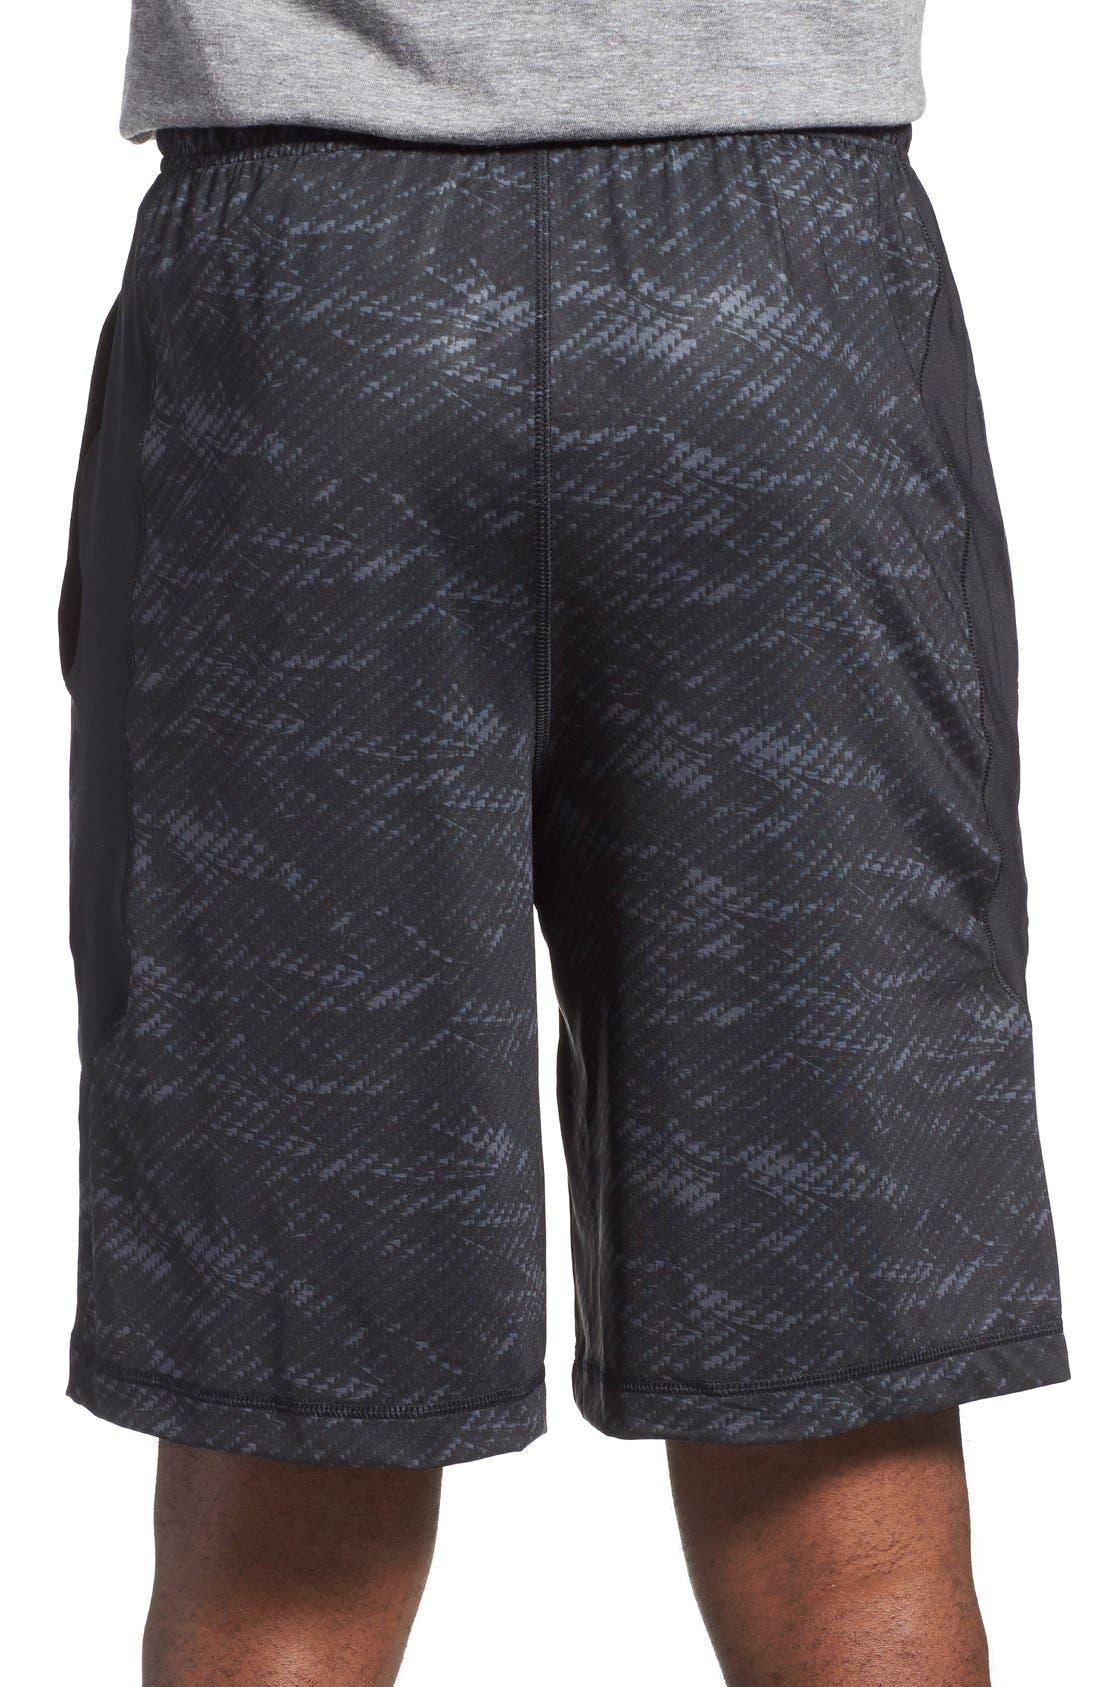 'Raid' HeatGear<sup>®</sup> Loose Fit Athletic Shorts,                             Alternate thumbnail 2, color,                             Black/ Black/ Steel